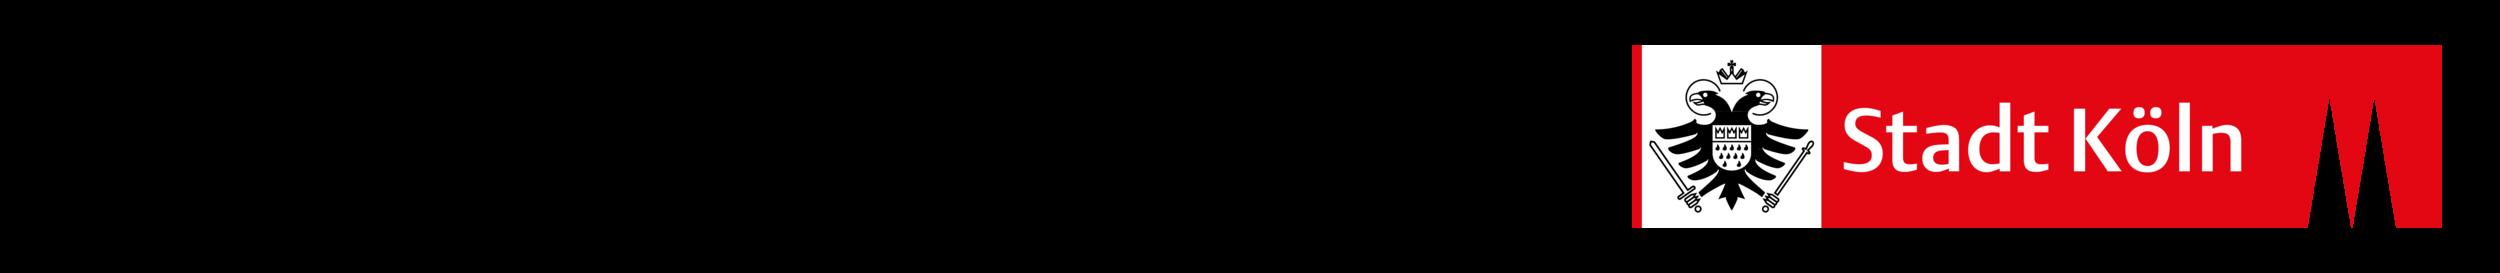 logofriedhof-2018.png